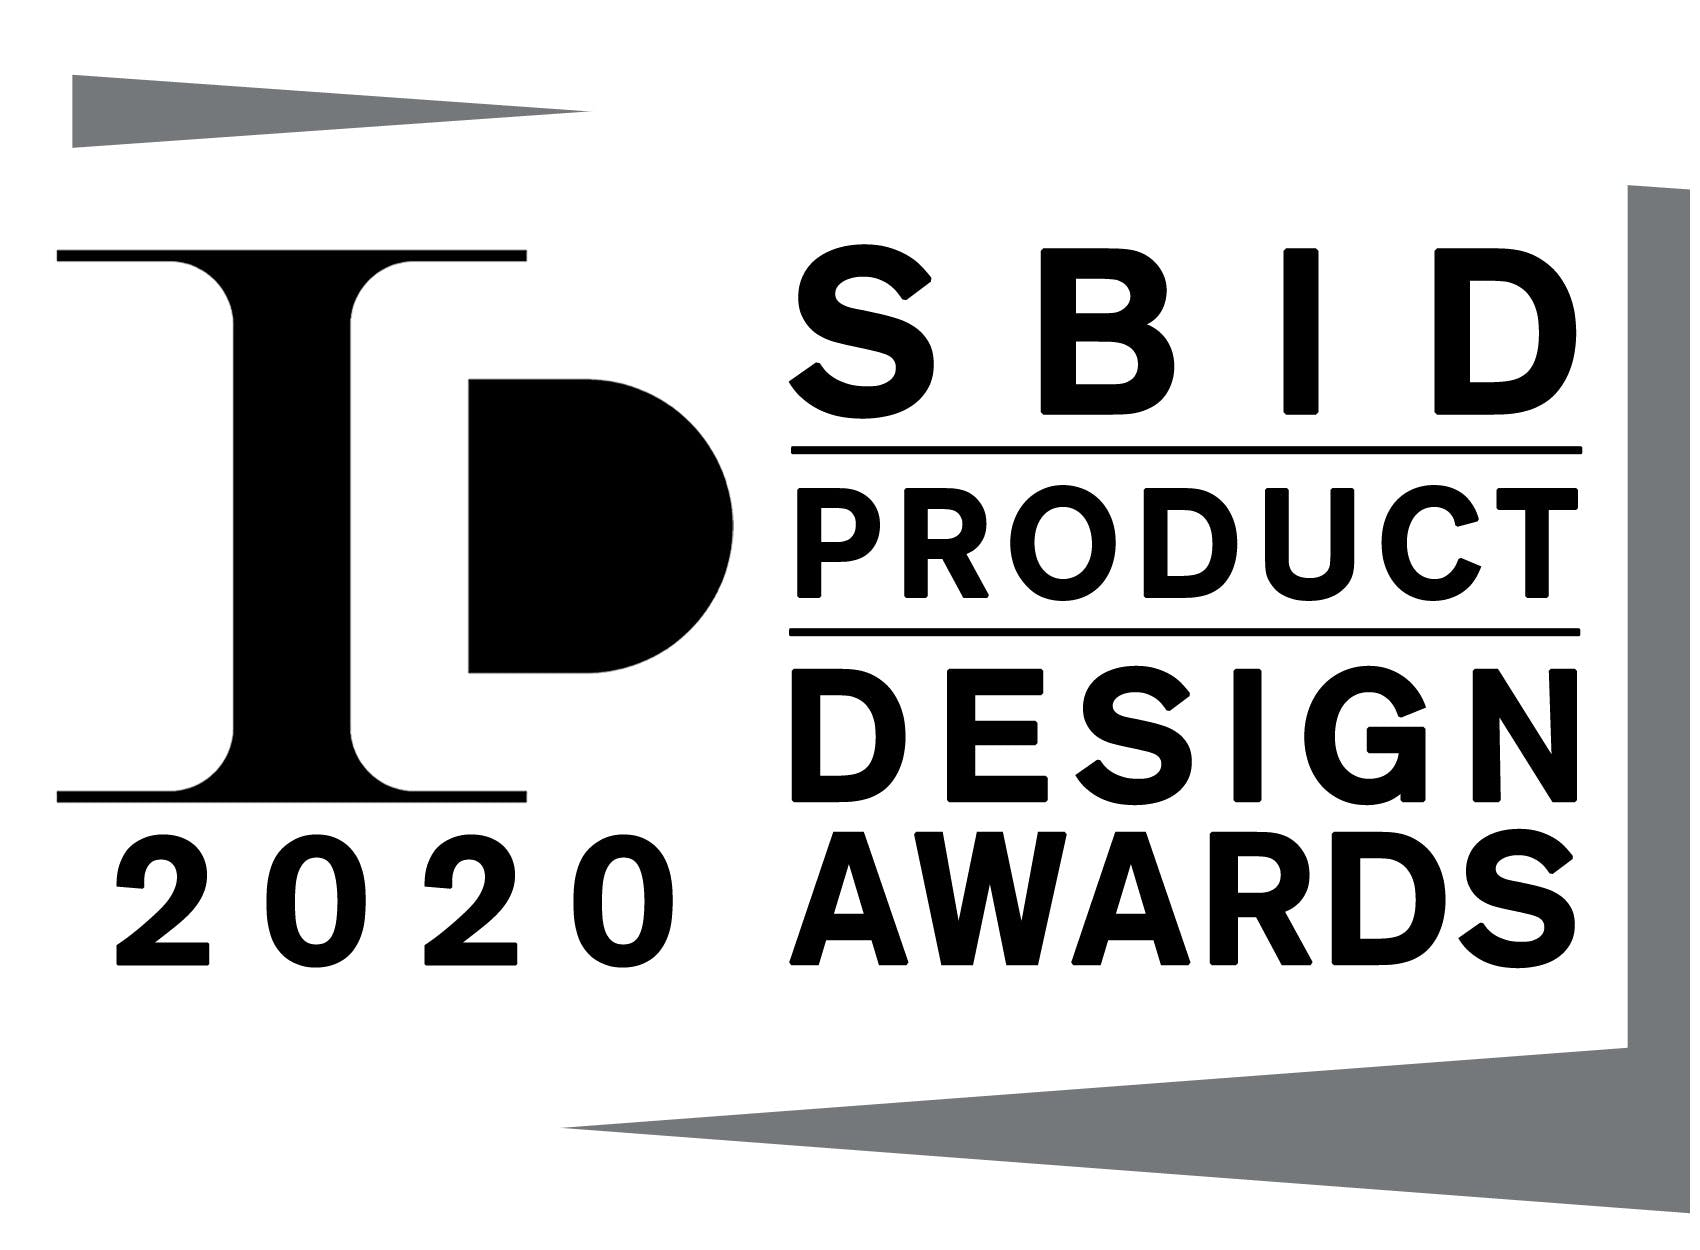 Image of sbid logo in Vote for Dekton Slim in the SBID Product Design Awards 2020 - Cosentino